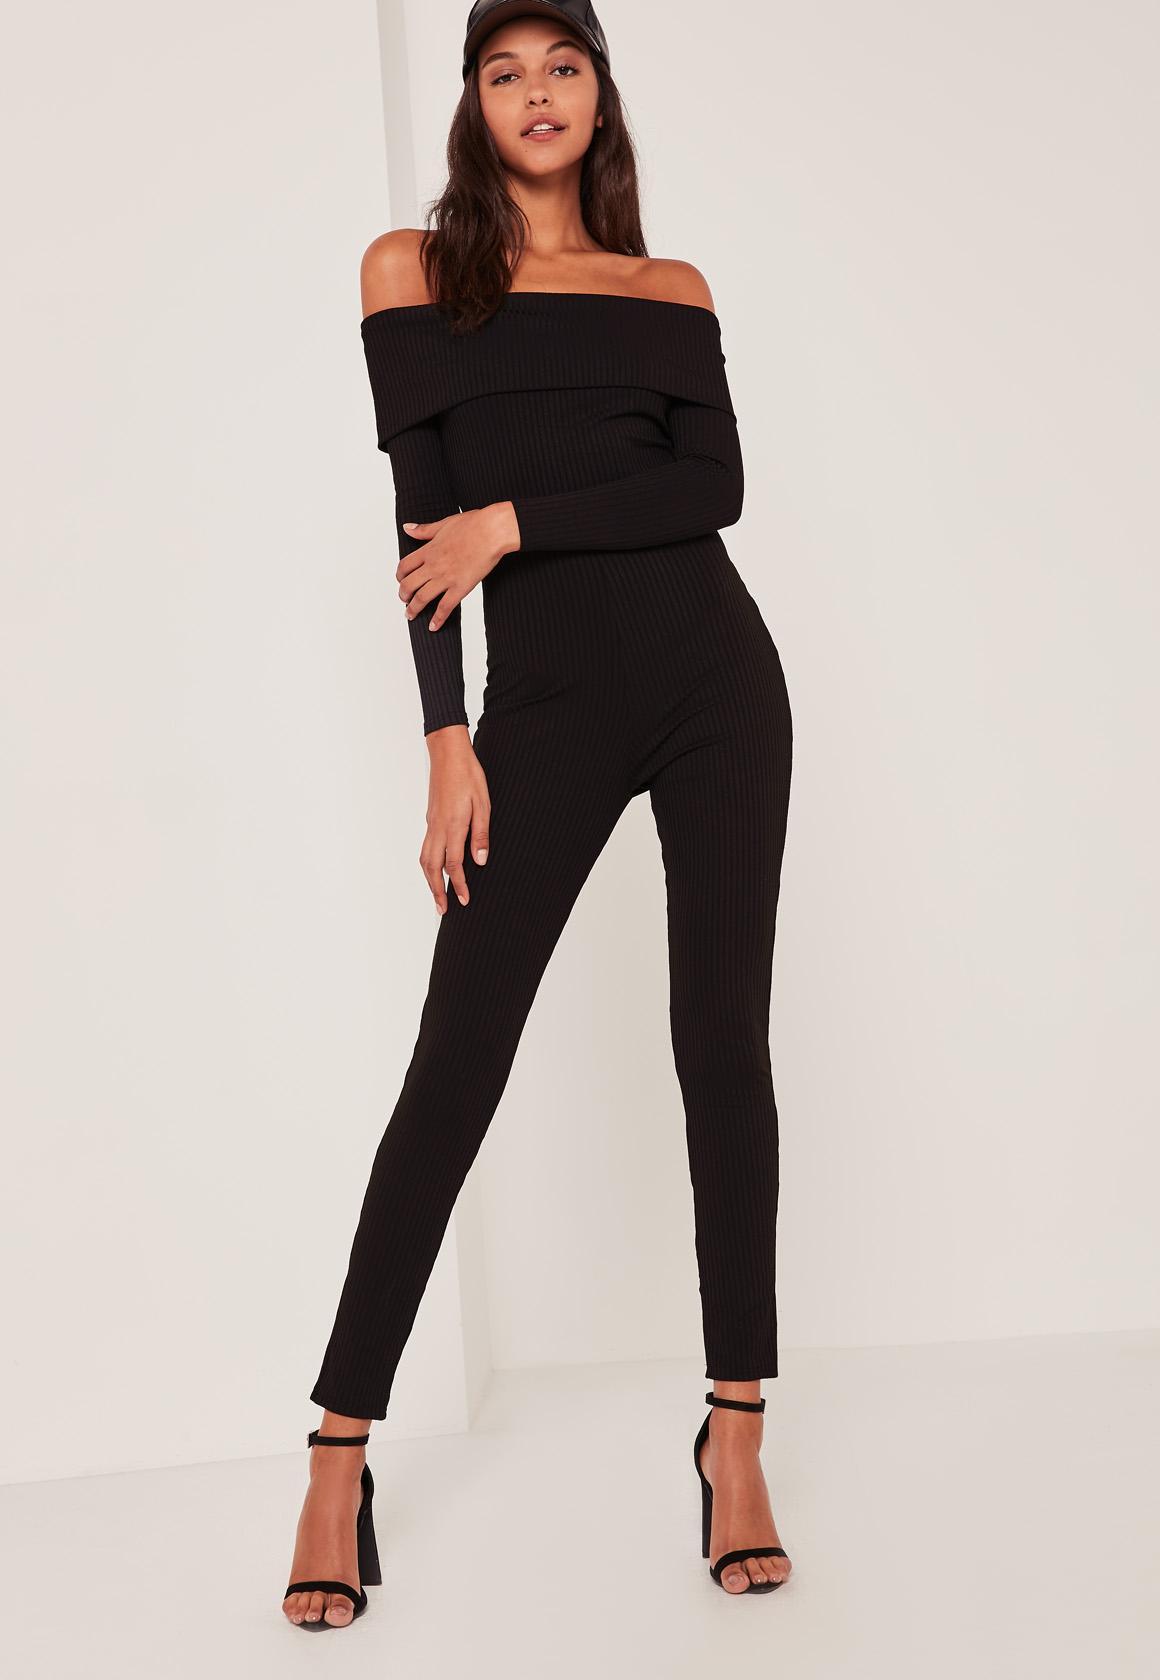 Black Fold Over Bardot Ribbed Jumpsuit - Missguided